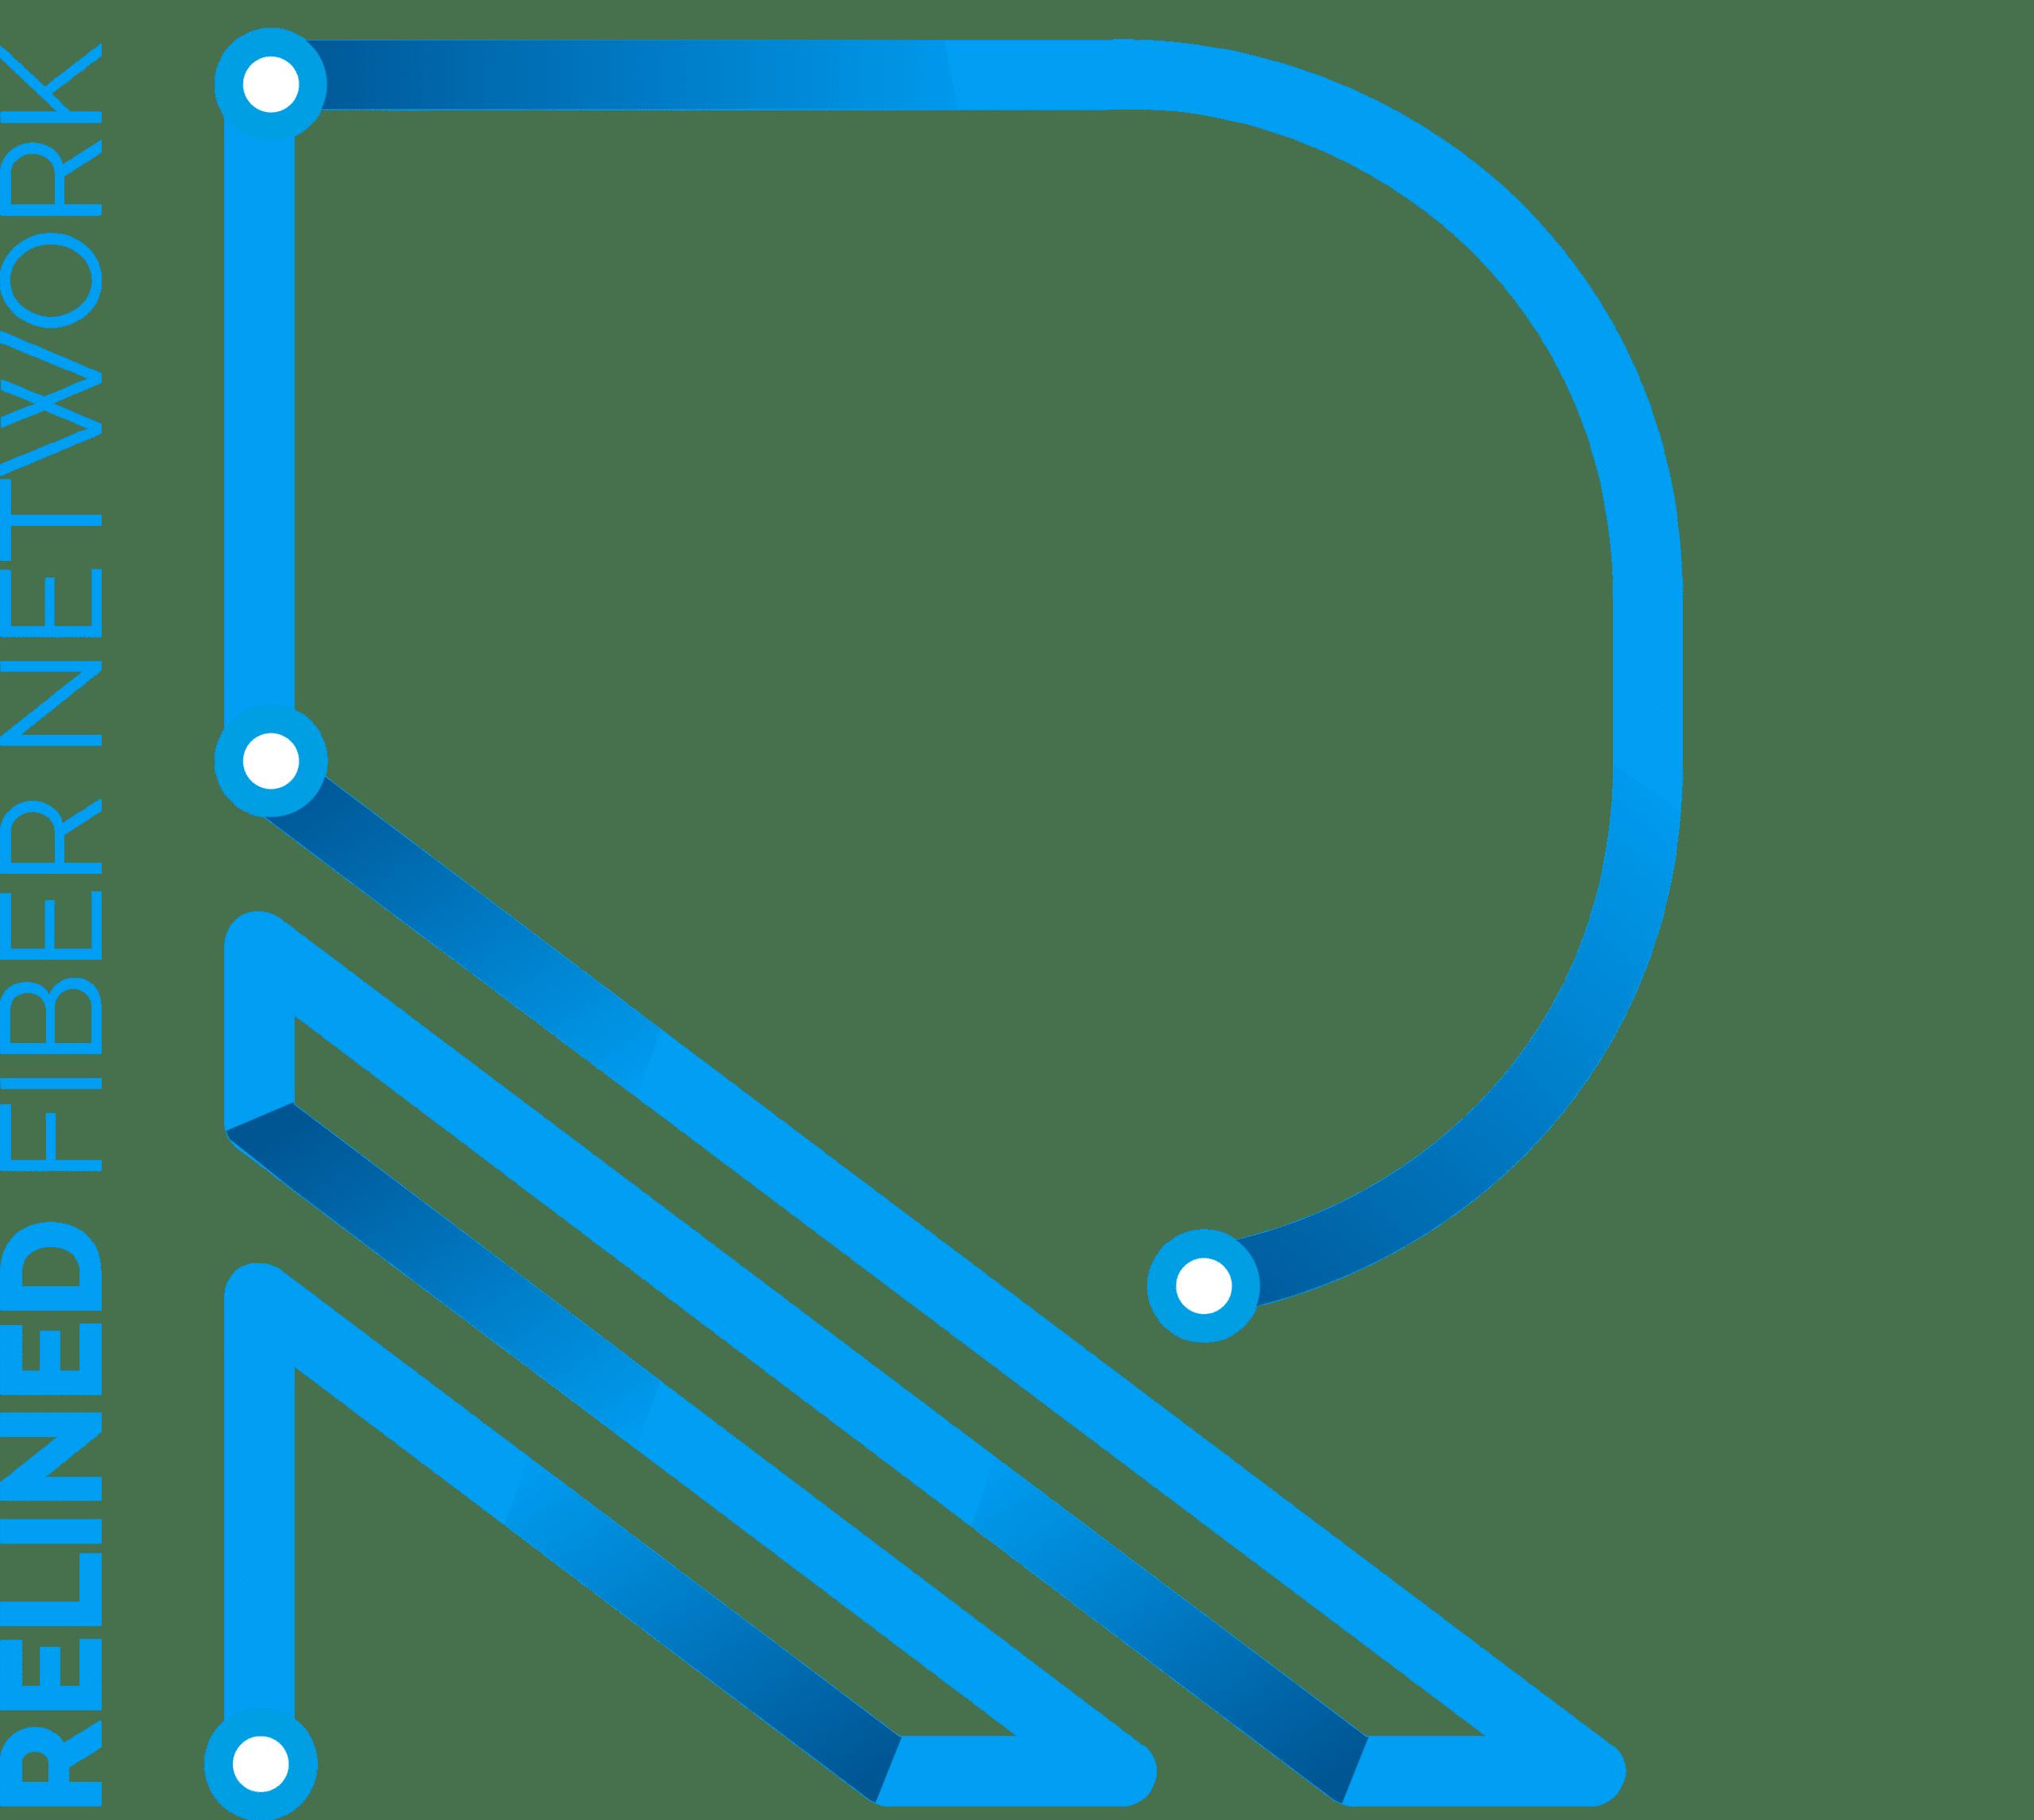 Relined Fiber Network